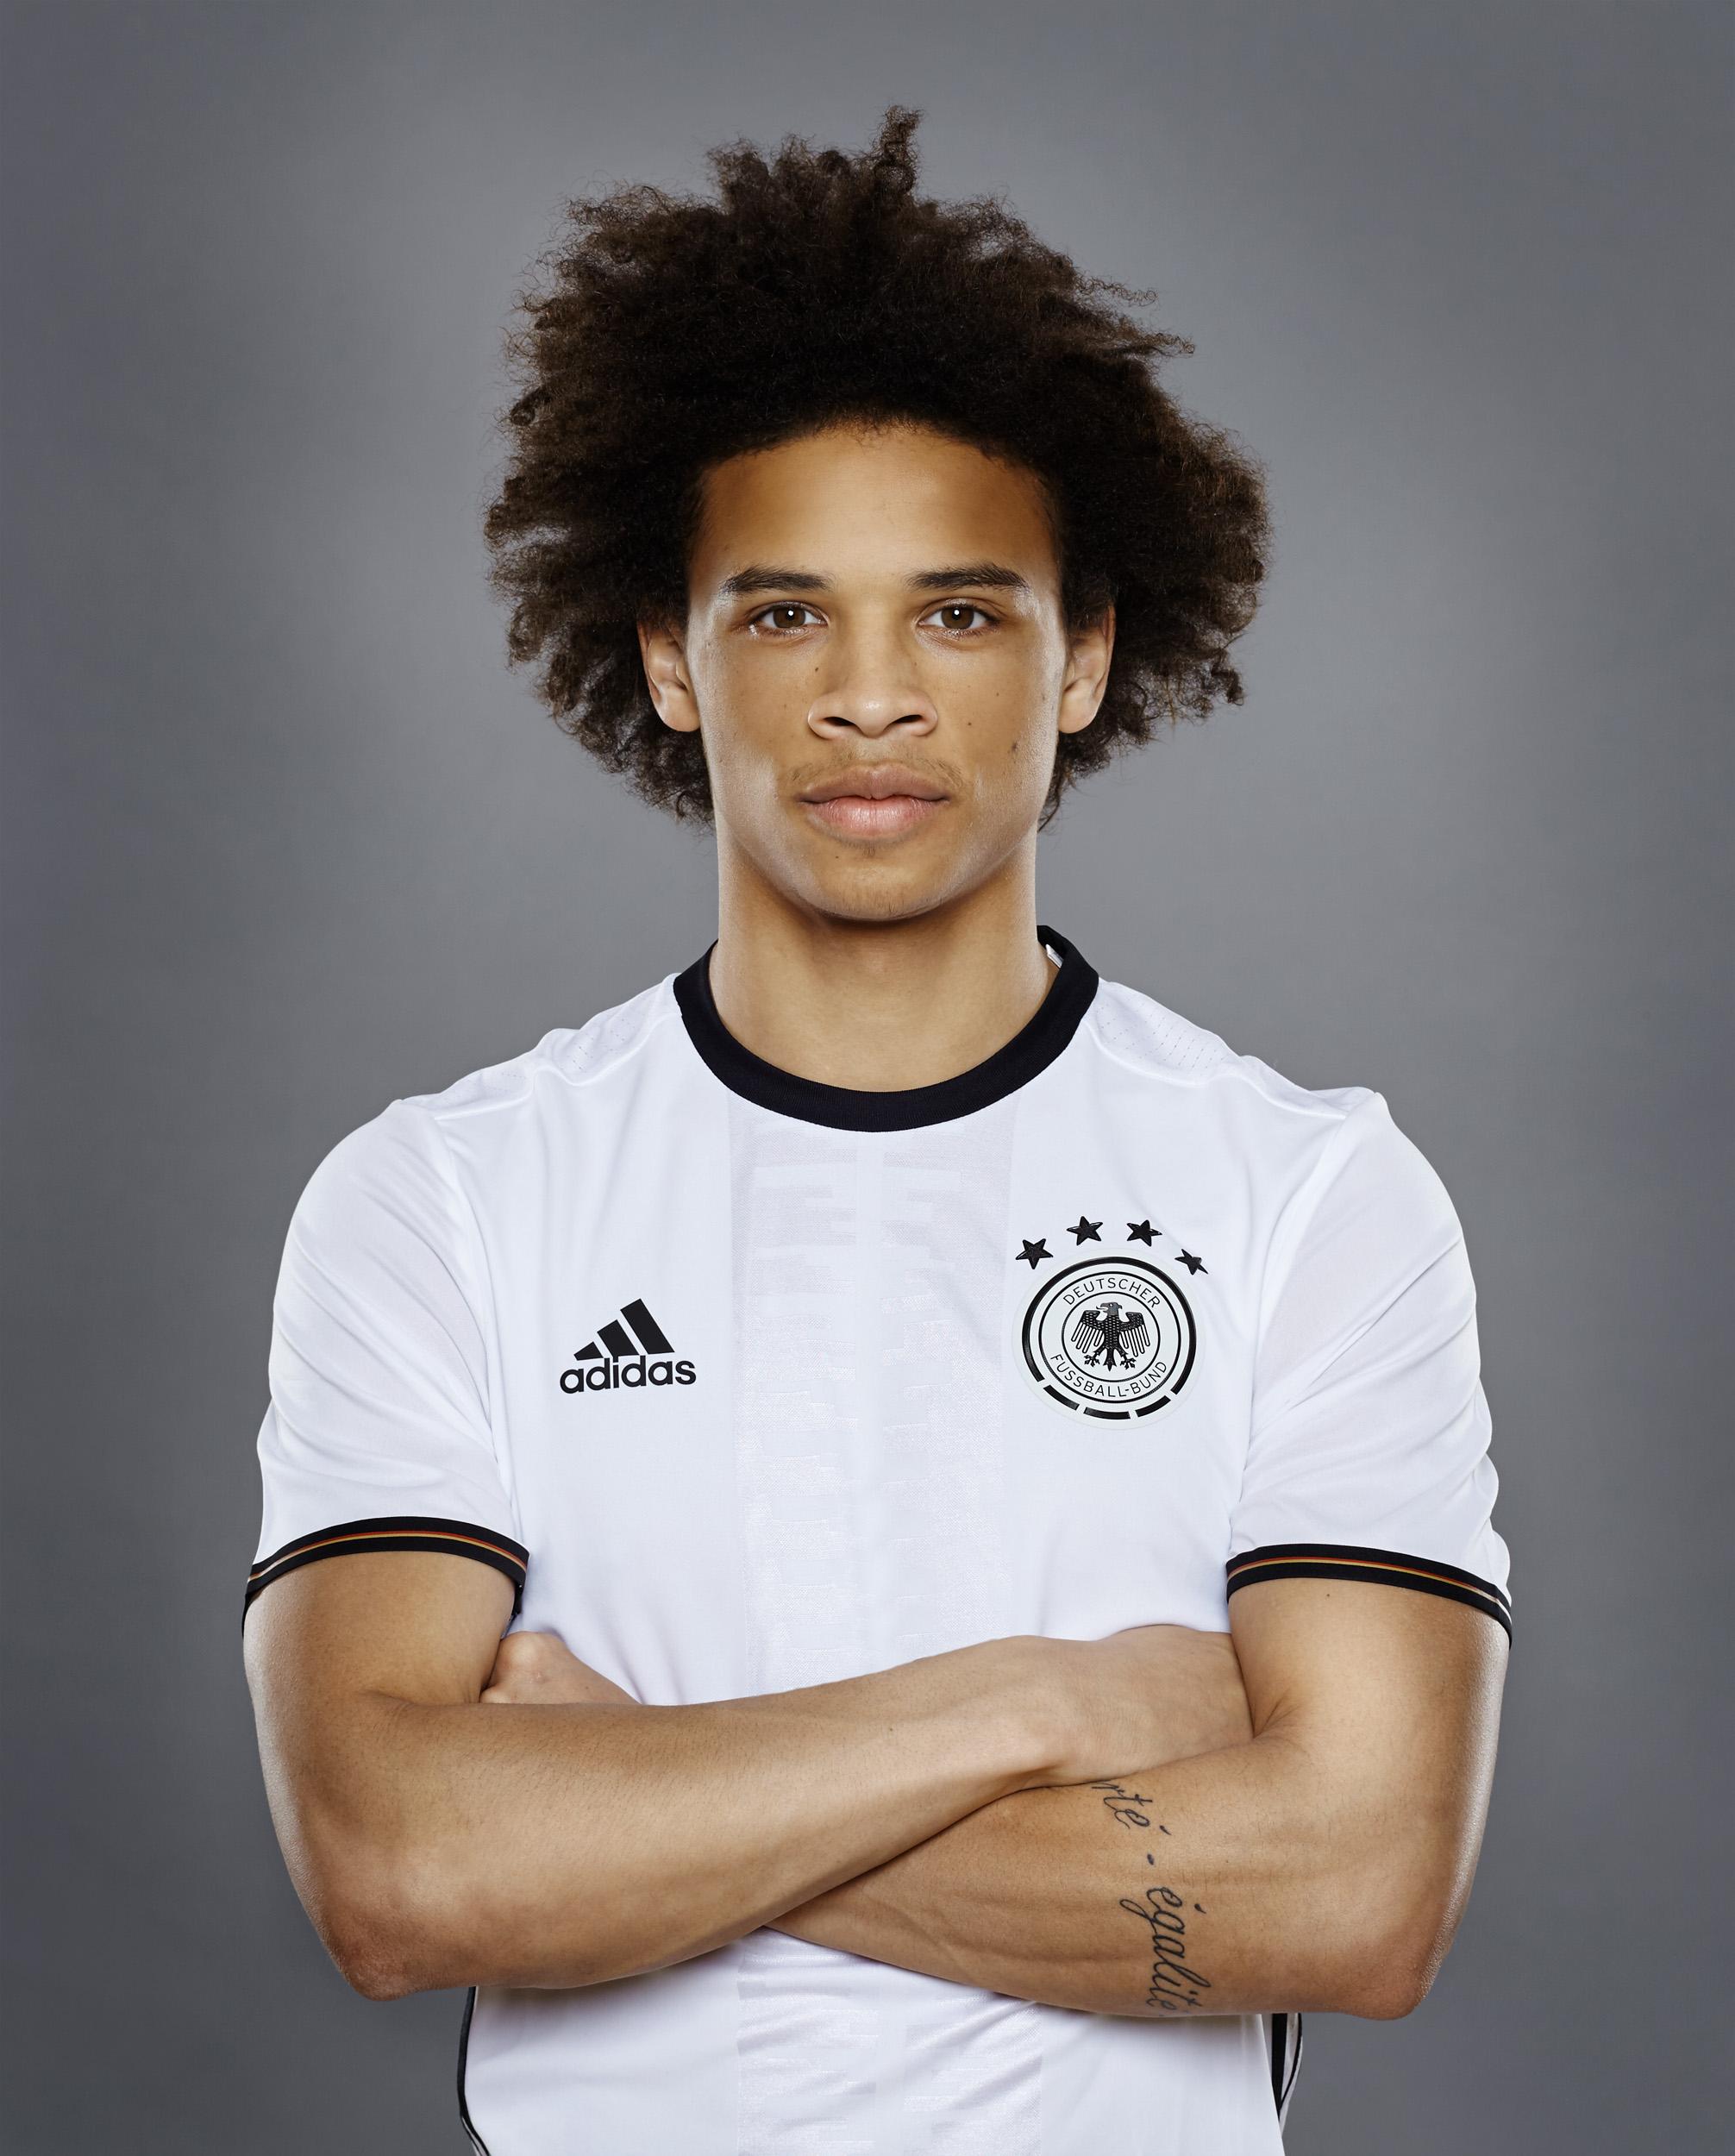 : Leroy Sané - soccer player